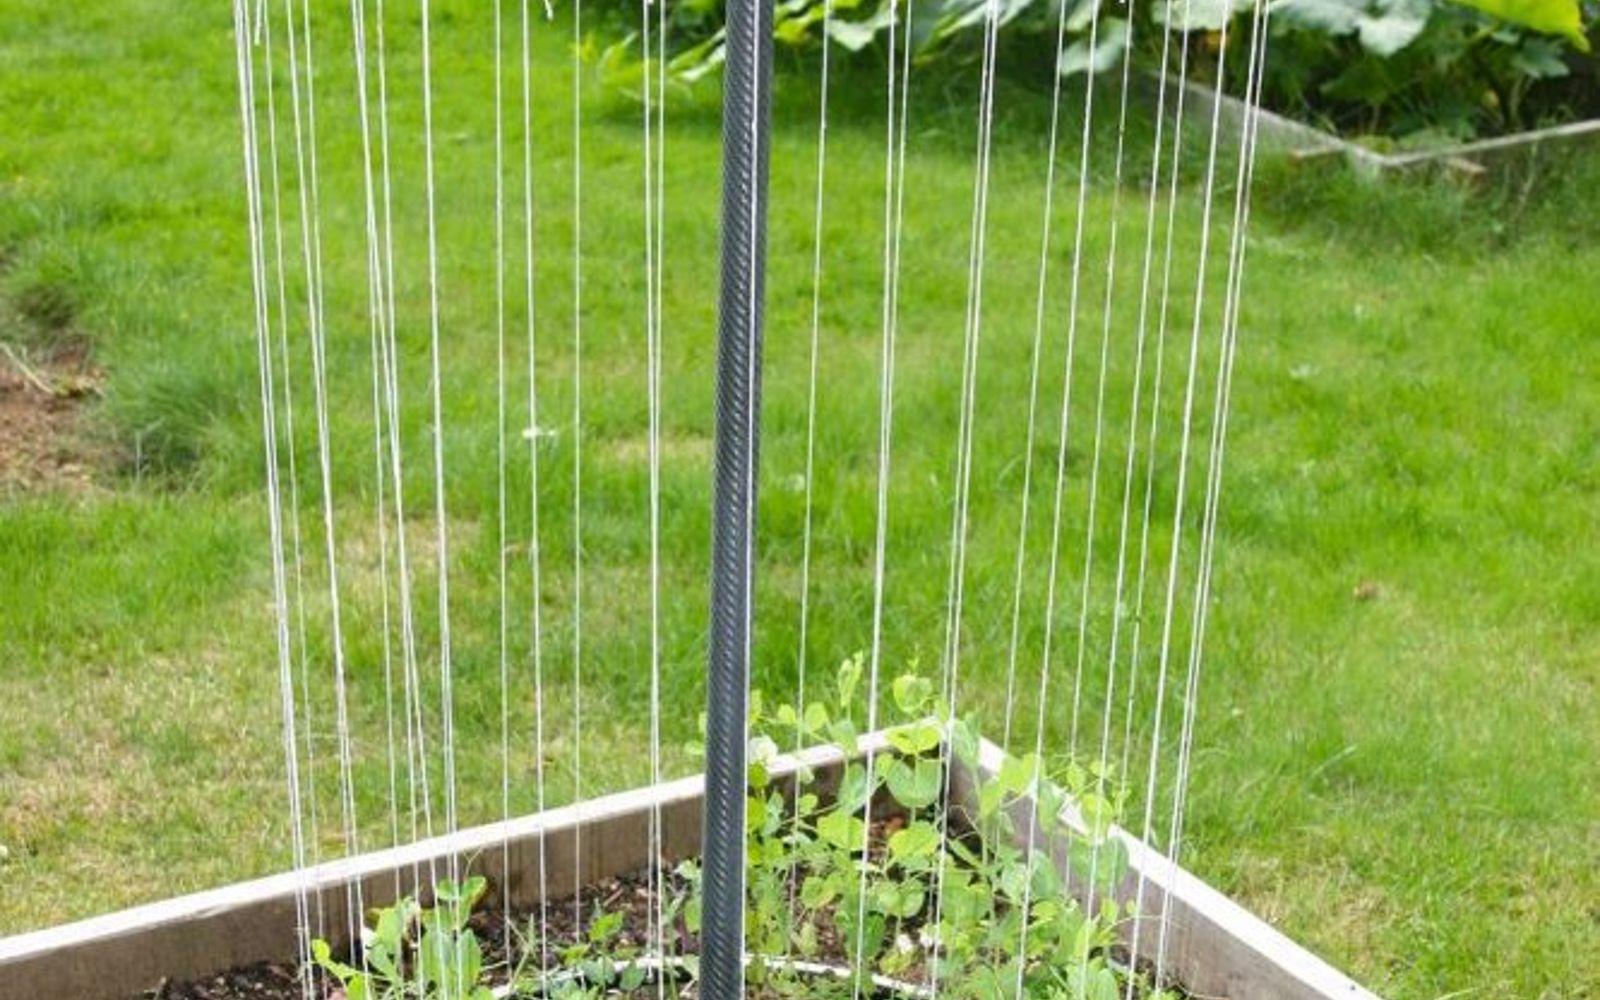 s 17 ways to build a gorgeous garden trellis this summer, gardening, Turn bicycle wheels into round climbing space